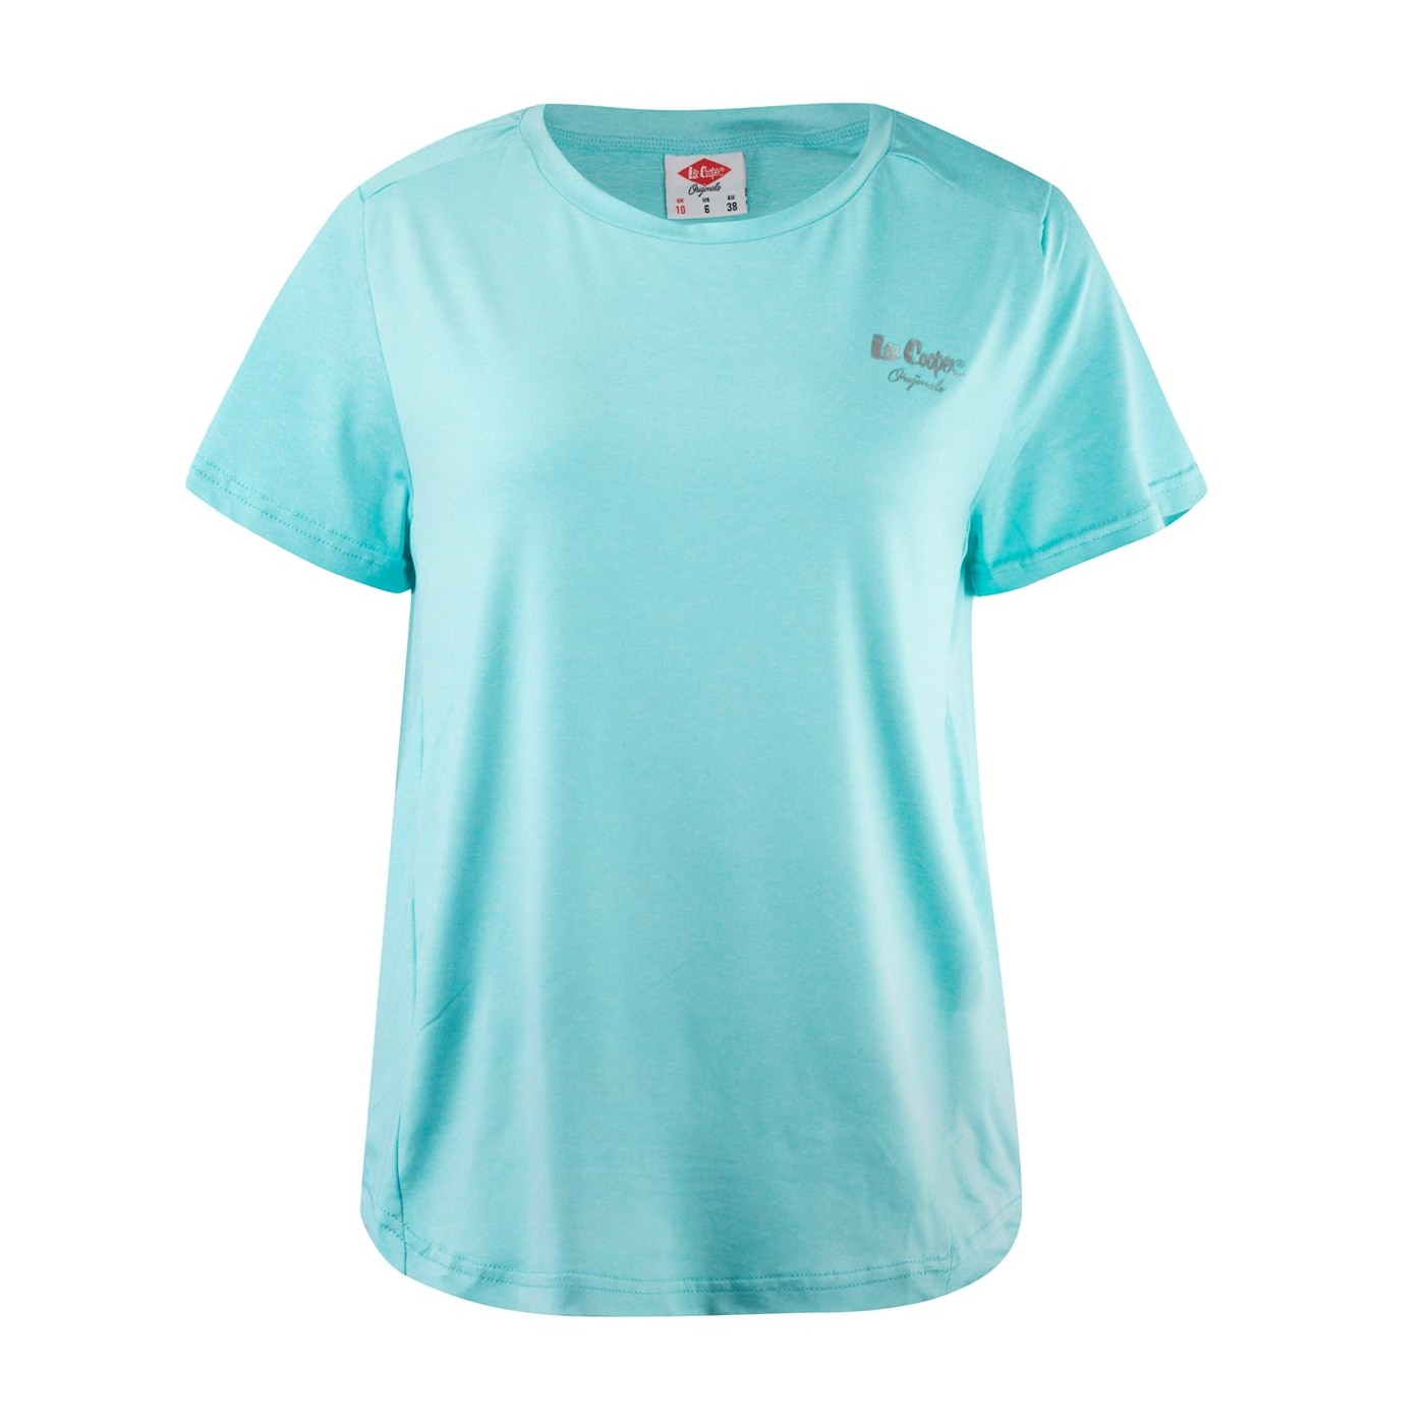 Lee Cooper Marl Stretch T Shirt Ladies